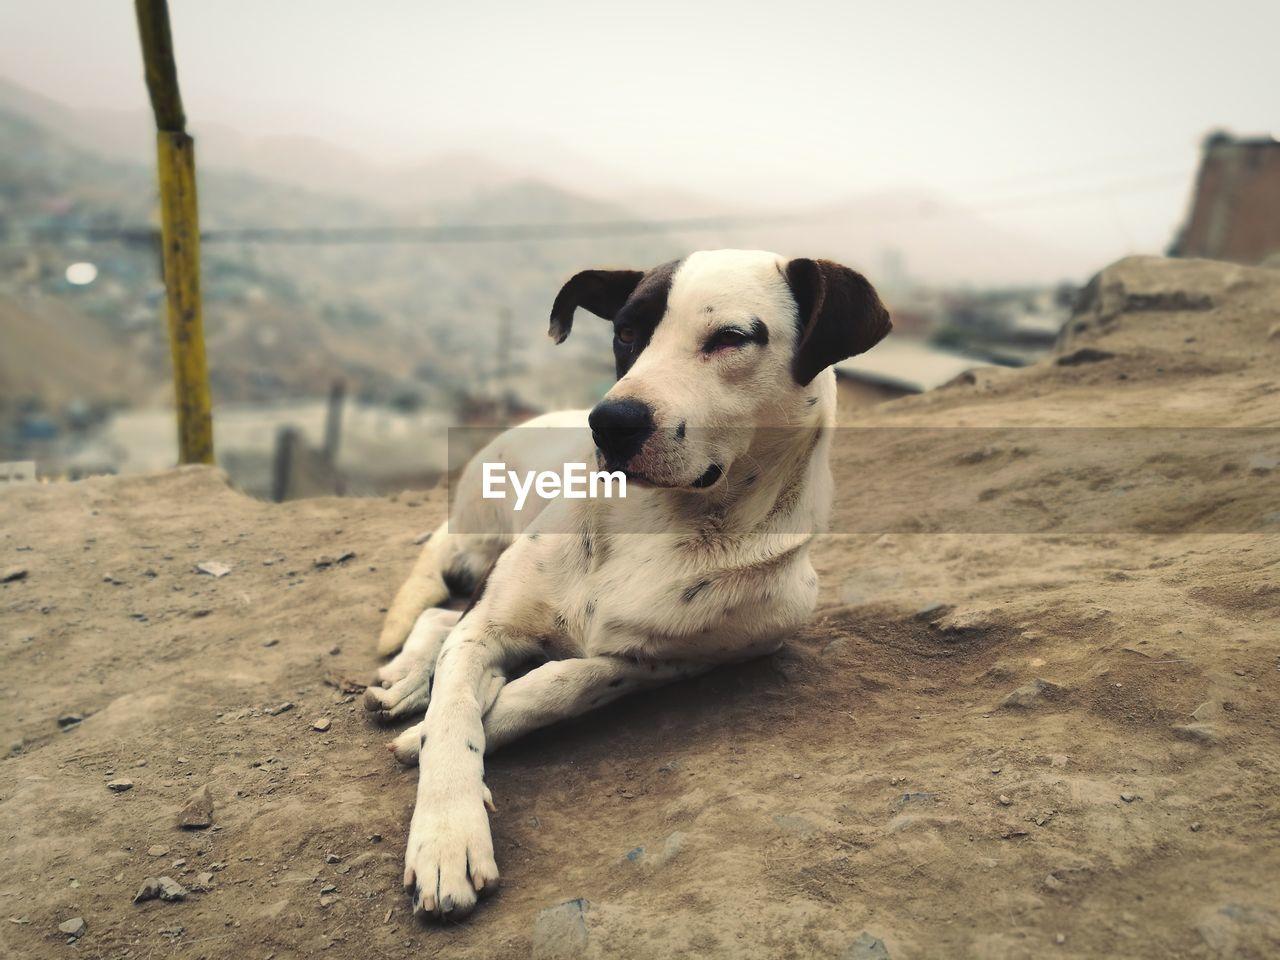 CLOSE-UP PORTRAIT OF DOG LYING ON DIRT